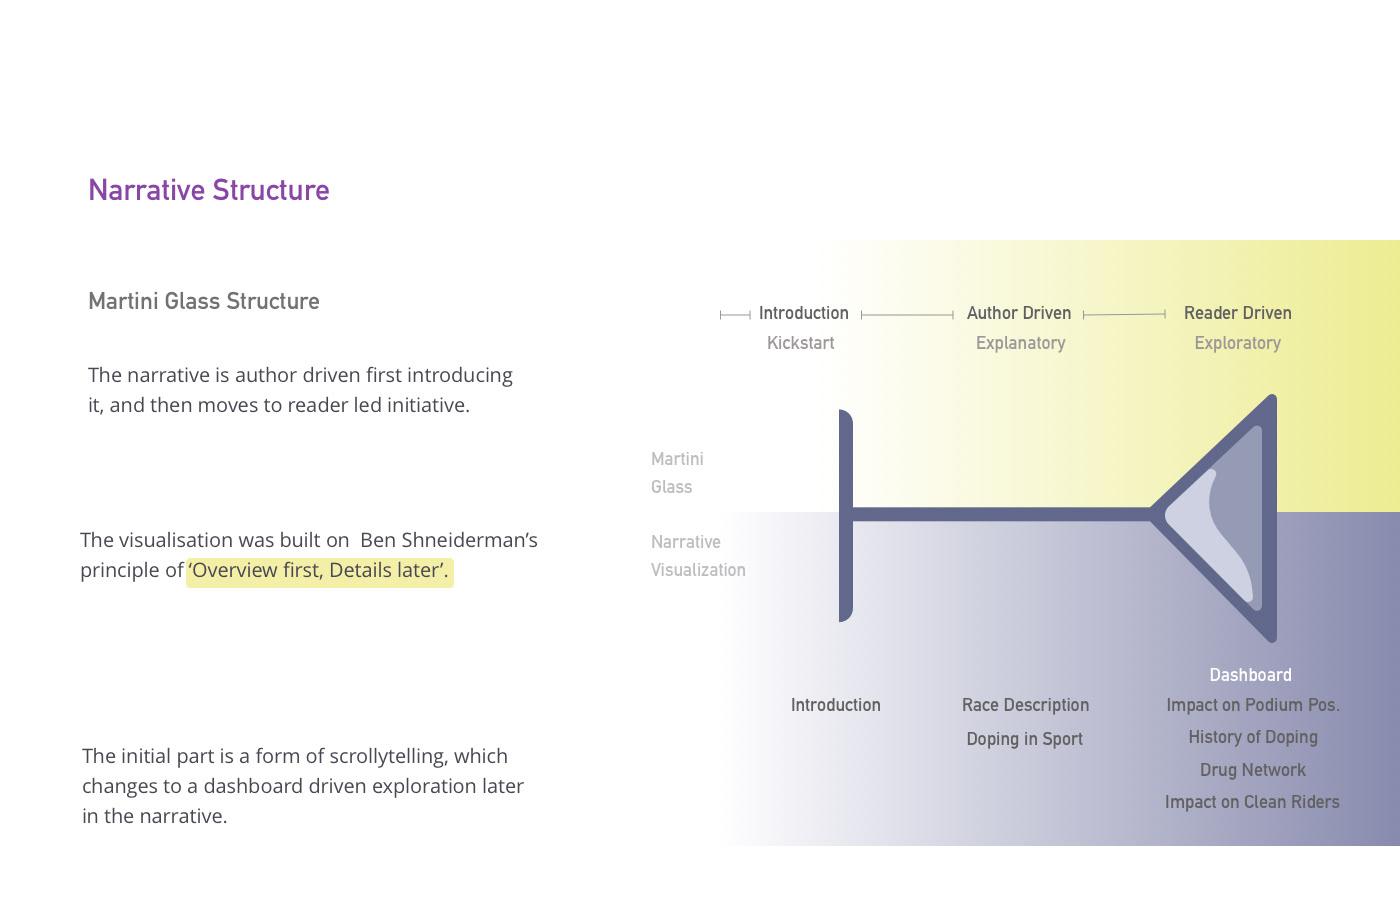 data visualisation data journalism Narrative Visualisation UX design information design Web Narrative adobeawards